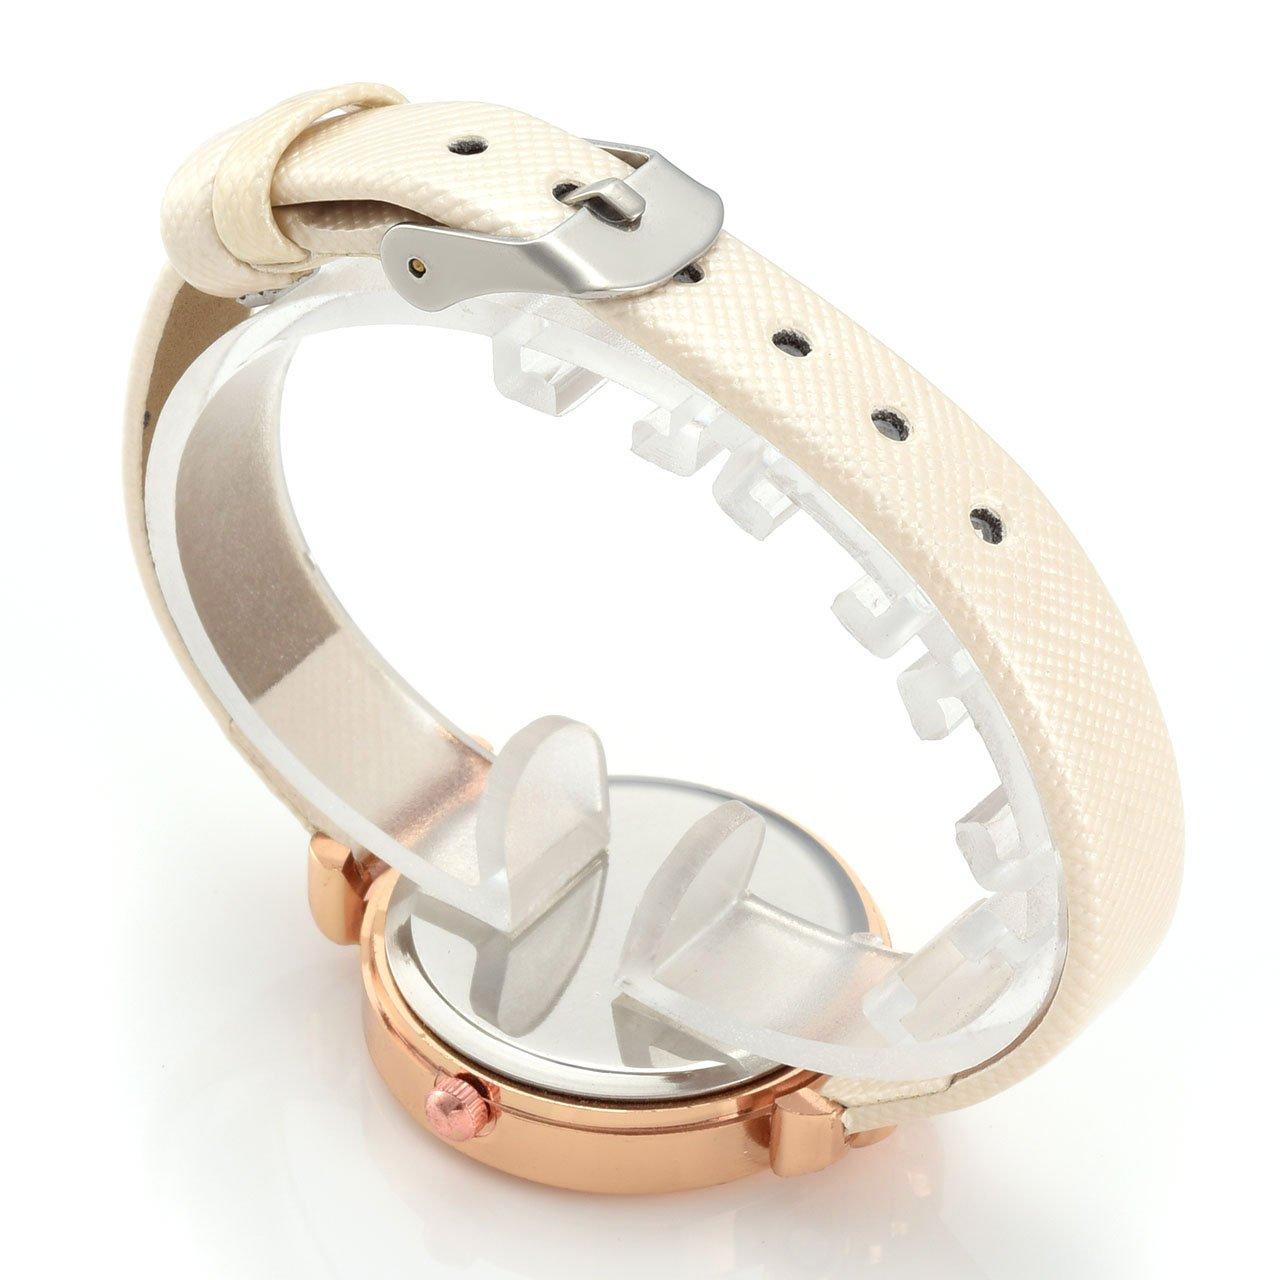 Top Plaza Women Fashion Watches Leather Band Luxury Analog Quartz Watches Girls Ladies Wristwatch - White by Top Plaza (Image #6)